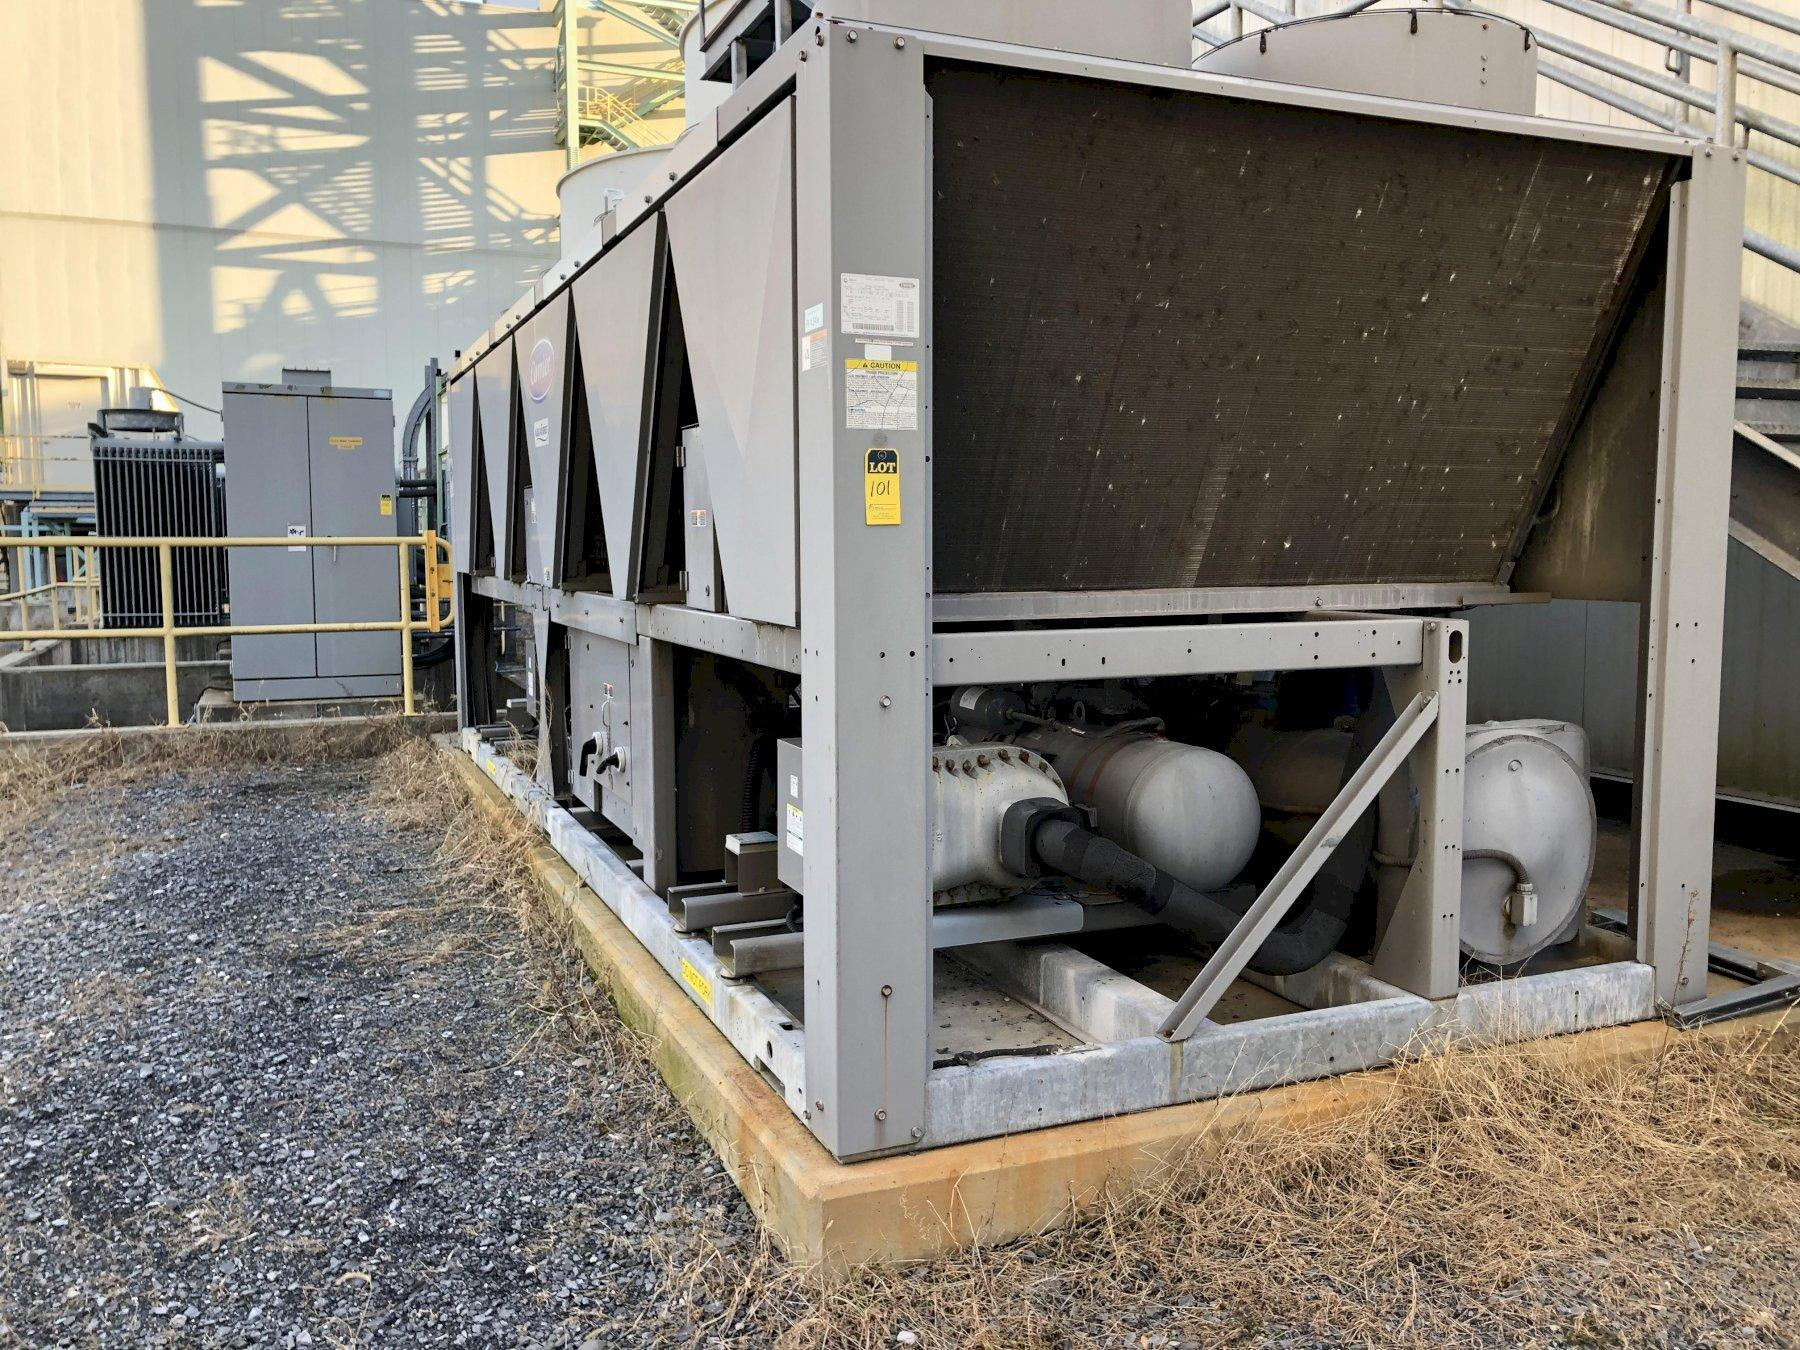 Carrier model 30xab1406-ogs63 chiller s/n 0511q91846, 10- 3.6 hp fans, 2- compressors